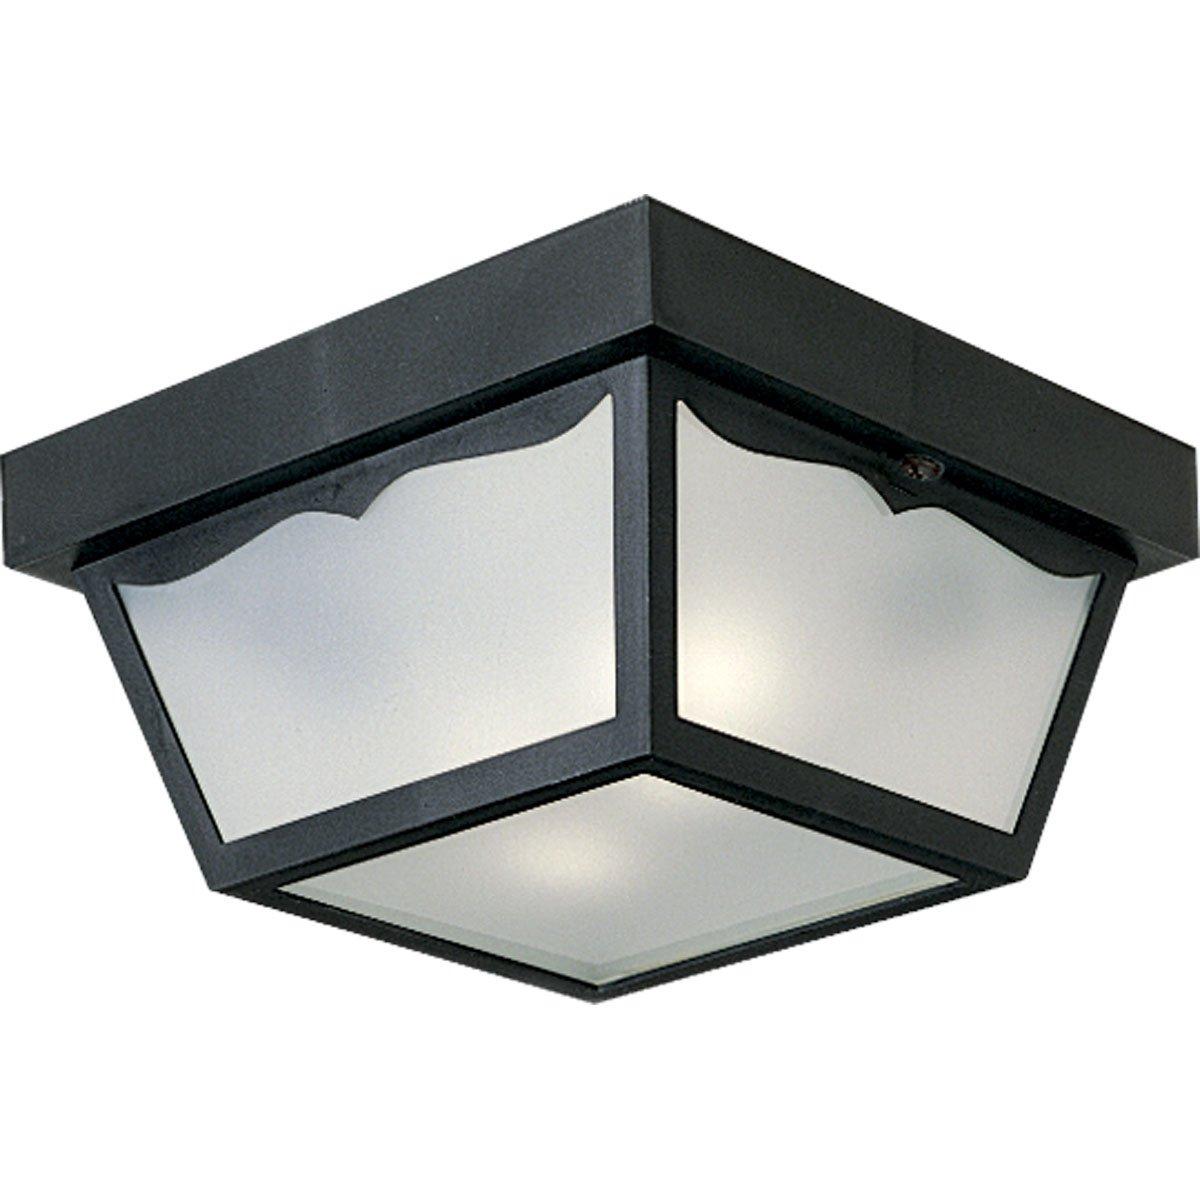 Progress Lighting P5745-31 Non-Metallic Ceiling Light with 1-Piece White Acrylic Diffuser, Black